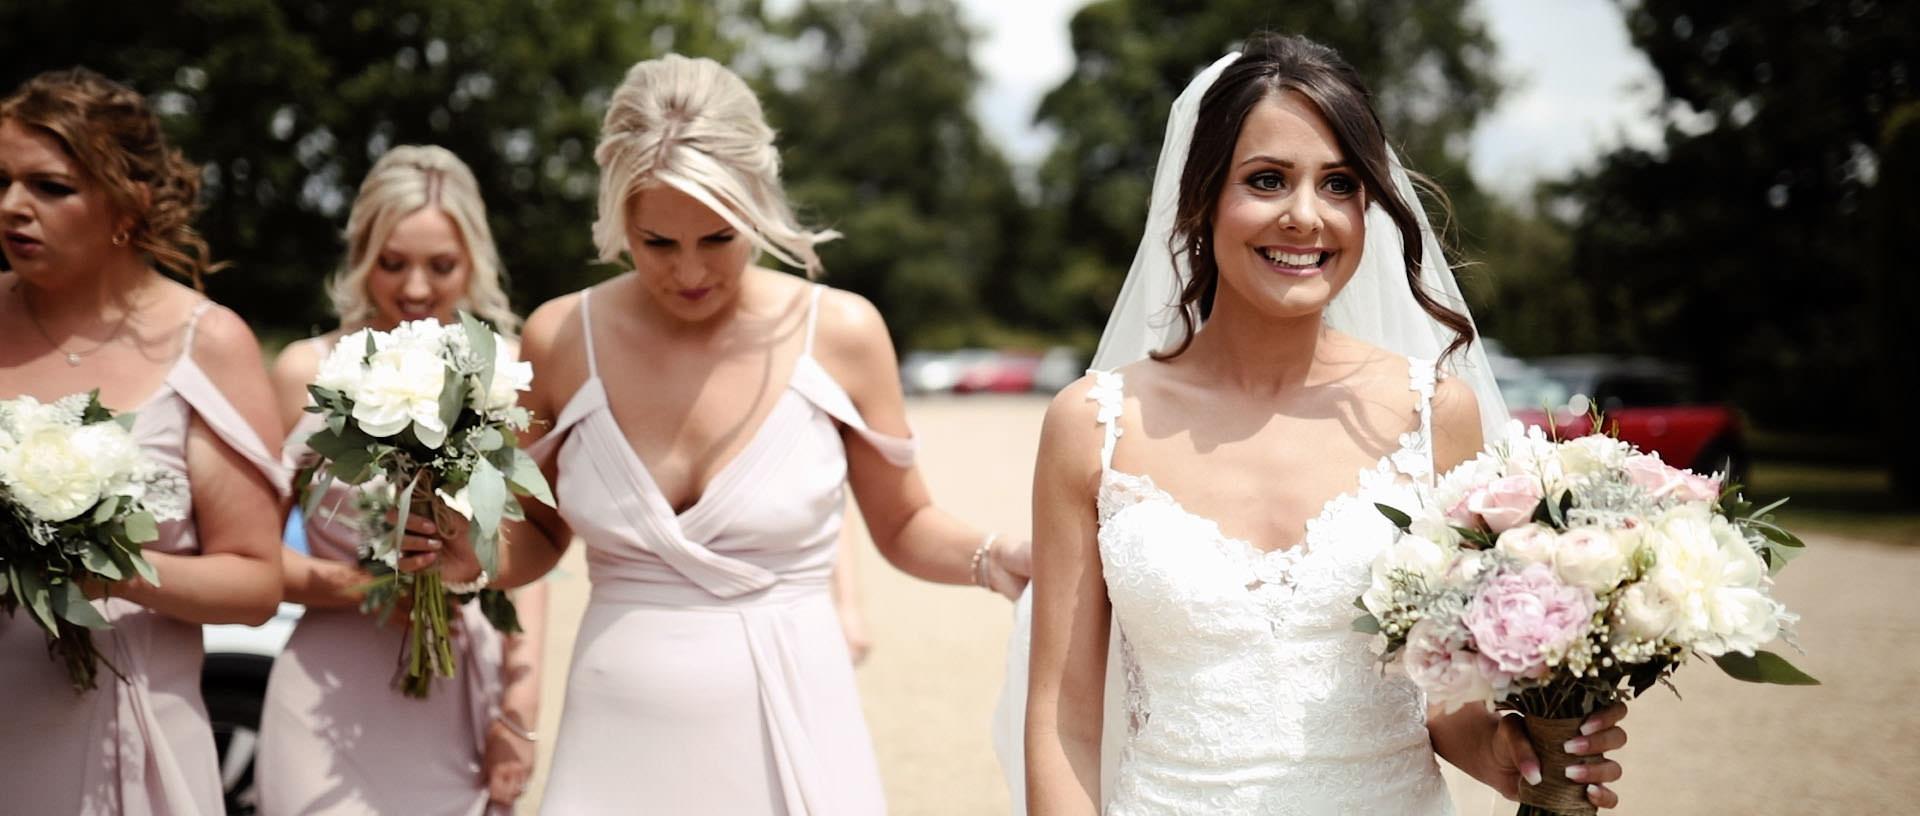 Hyde Barn Colswolds Wedding Verity-Jade & Kai 19 Cropped.jpg